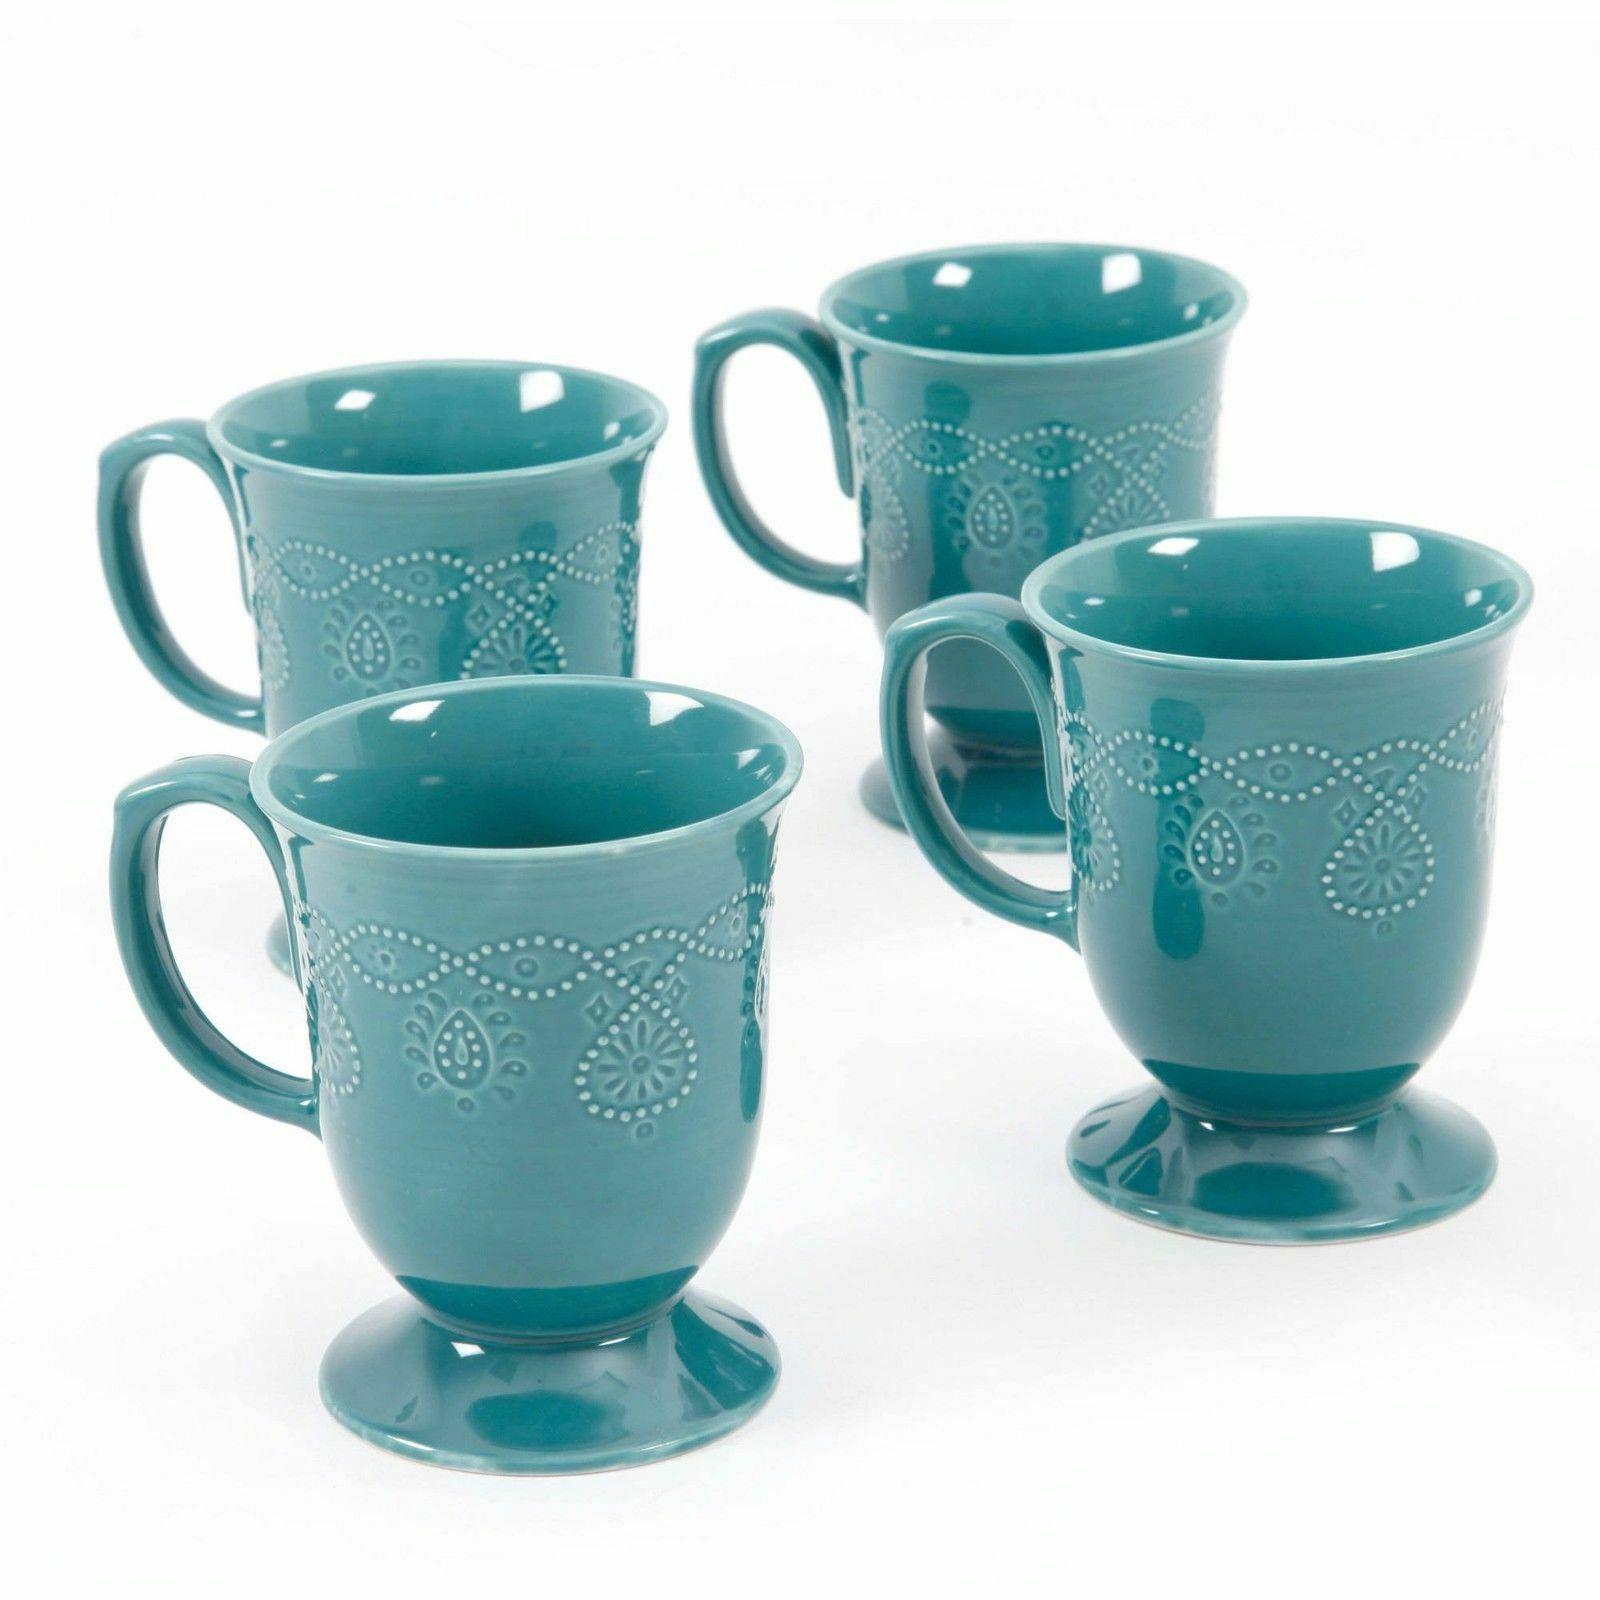 Teal Coffee Set Tea Cappuccino Cups Mugs 4 Piece Round Glaze